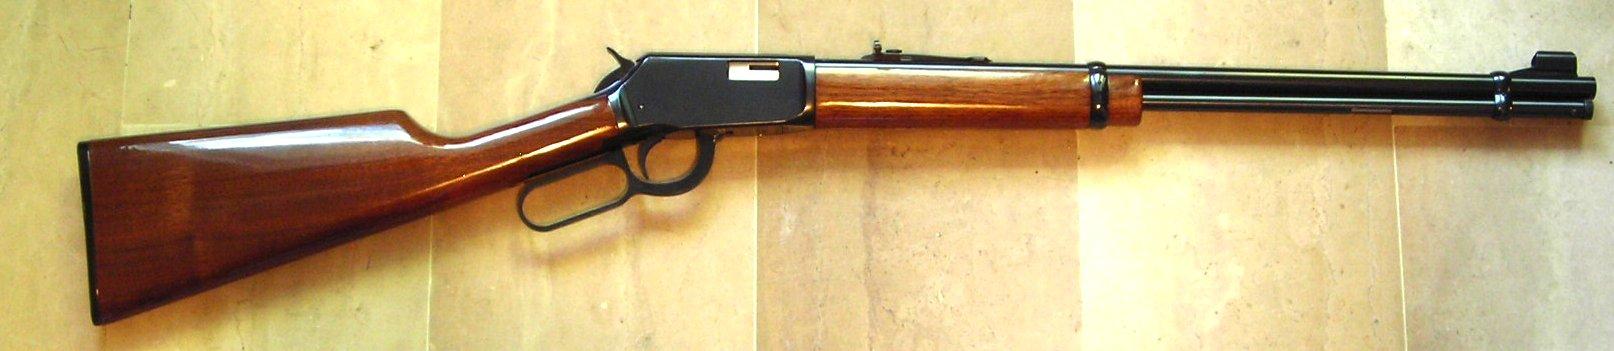 Winchester (époque Bennett) par JM Browning..... - Page 3 6579509422d